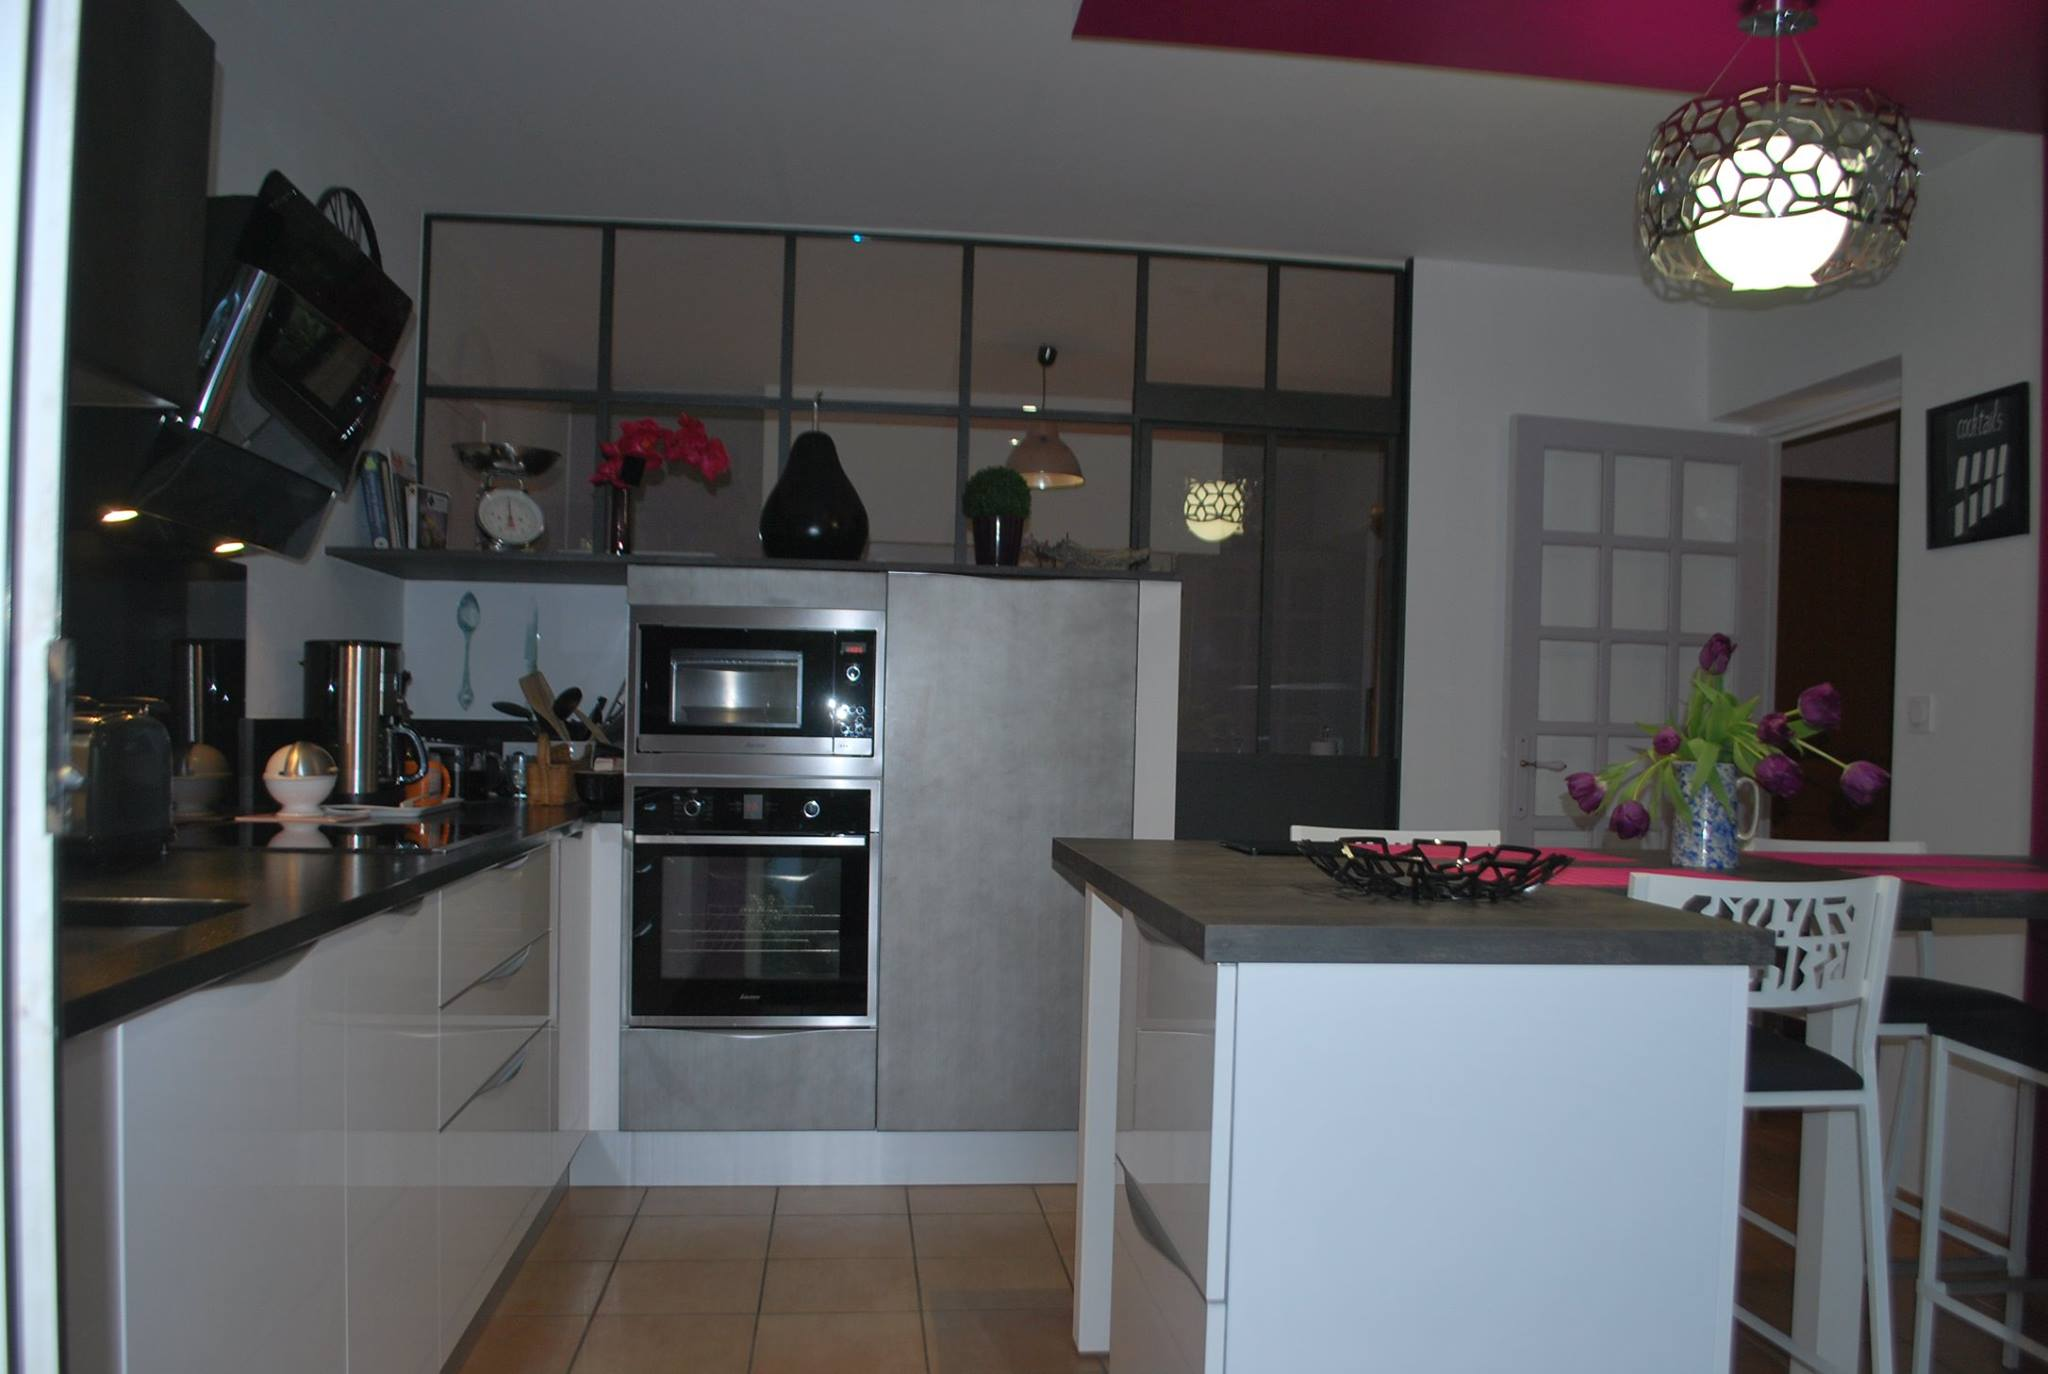 cuisine avec magnifique verri re cuisines kergourlay. Black Bedroom Furniture Sets. Home Design Ideas